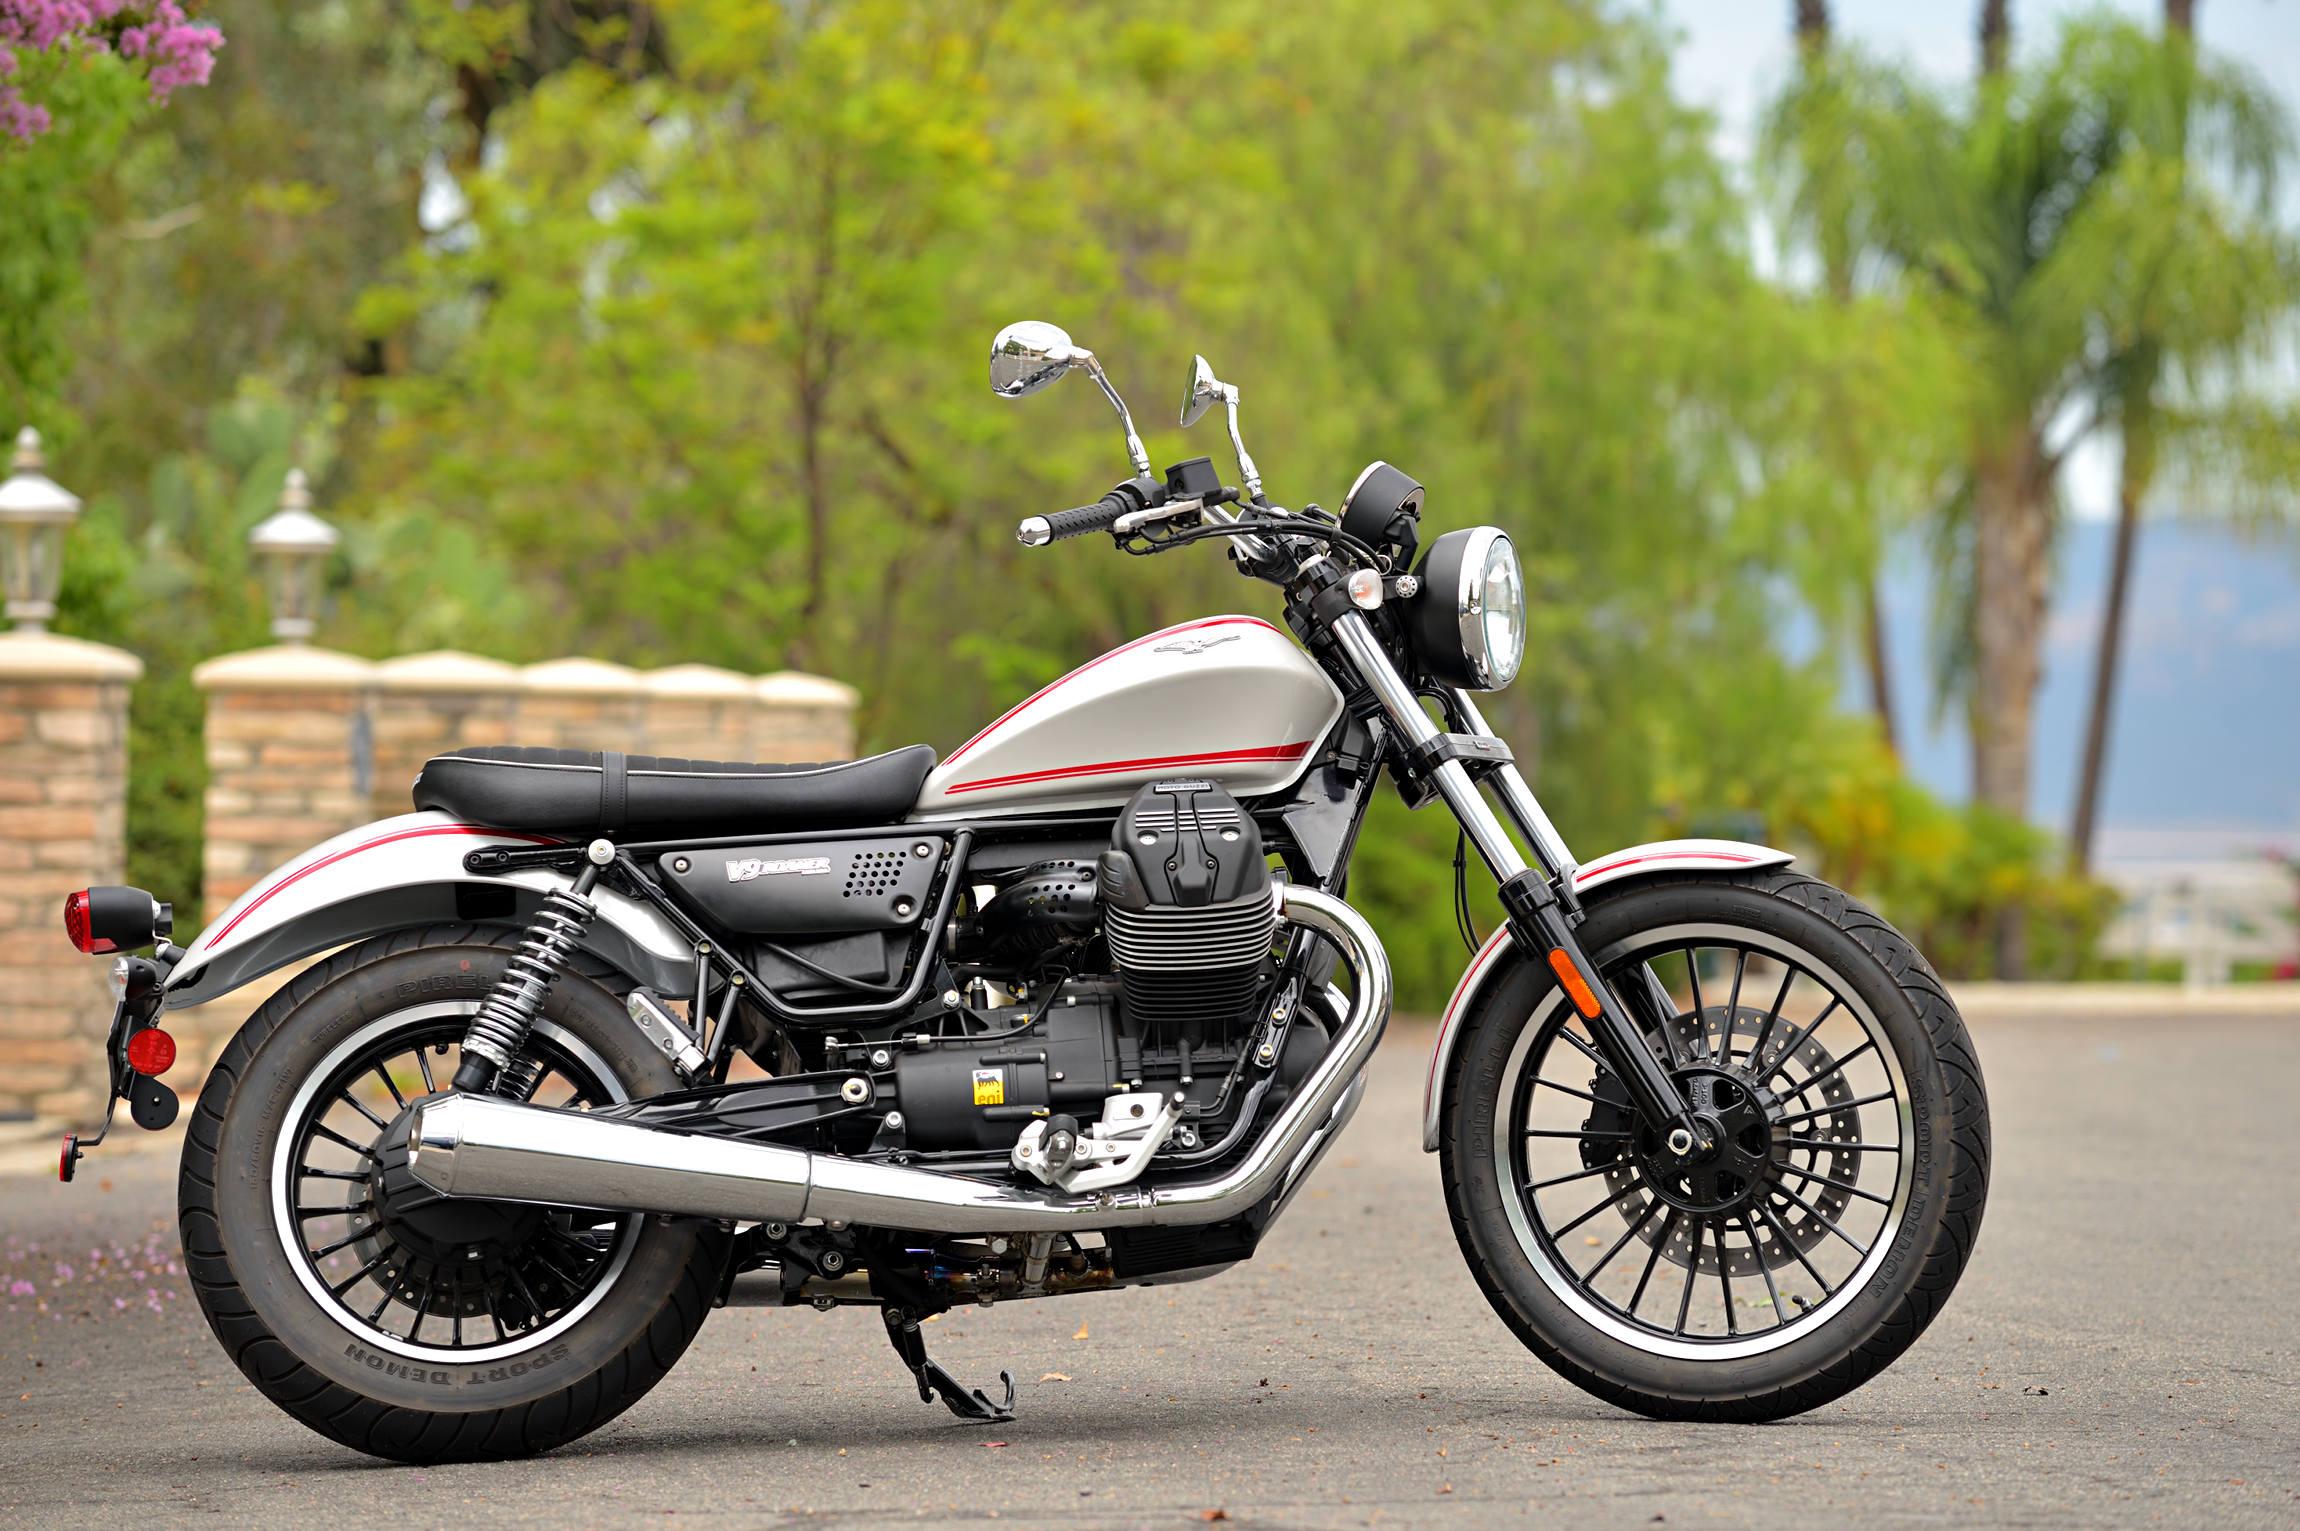 moto guzzi v9 roamer enters md test fleet motorcycle news editorials. Black Bedroom Furniture Sets. Home Design Ideas